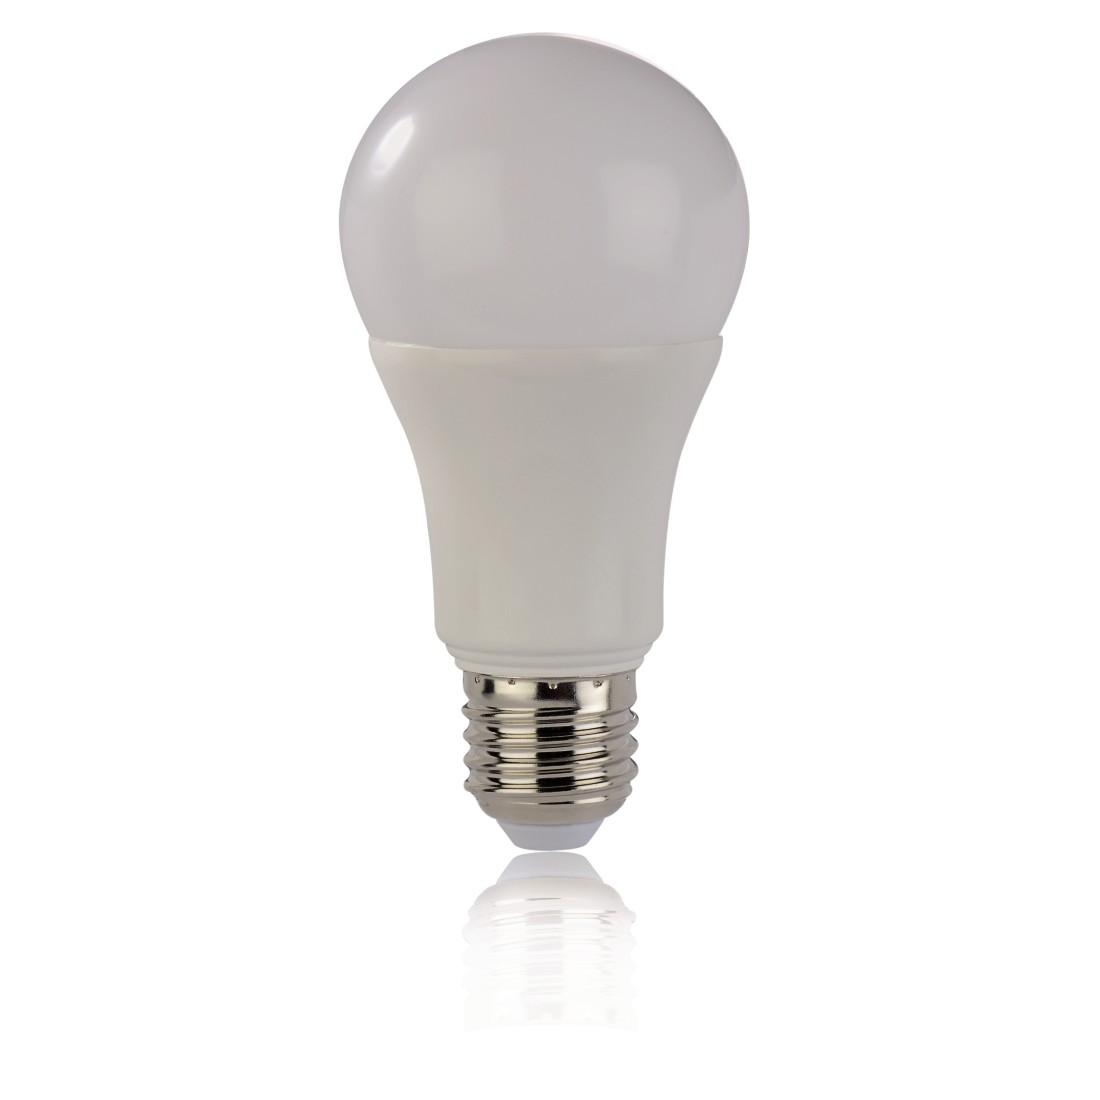 00112176 xavax led lampe e27 806lm ersetzt 60w gl hlampe warmwei dimmbar xavax. Black Bedroom Furniture Sets. Home Design Ideas